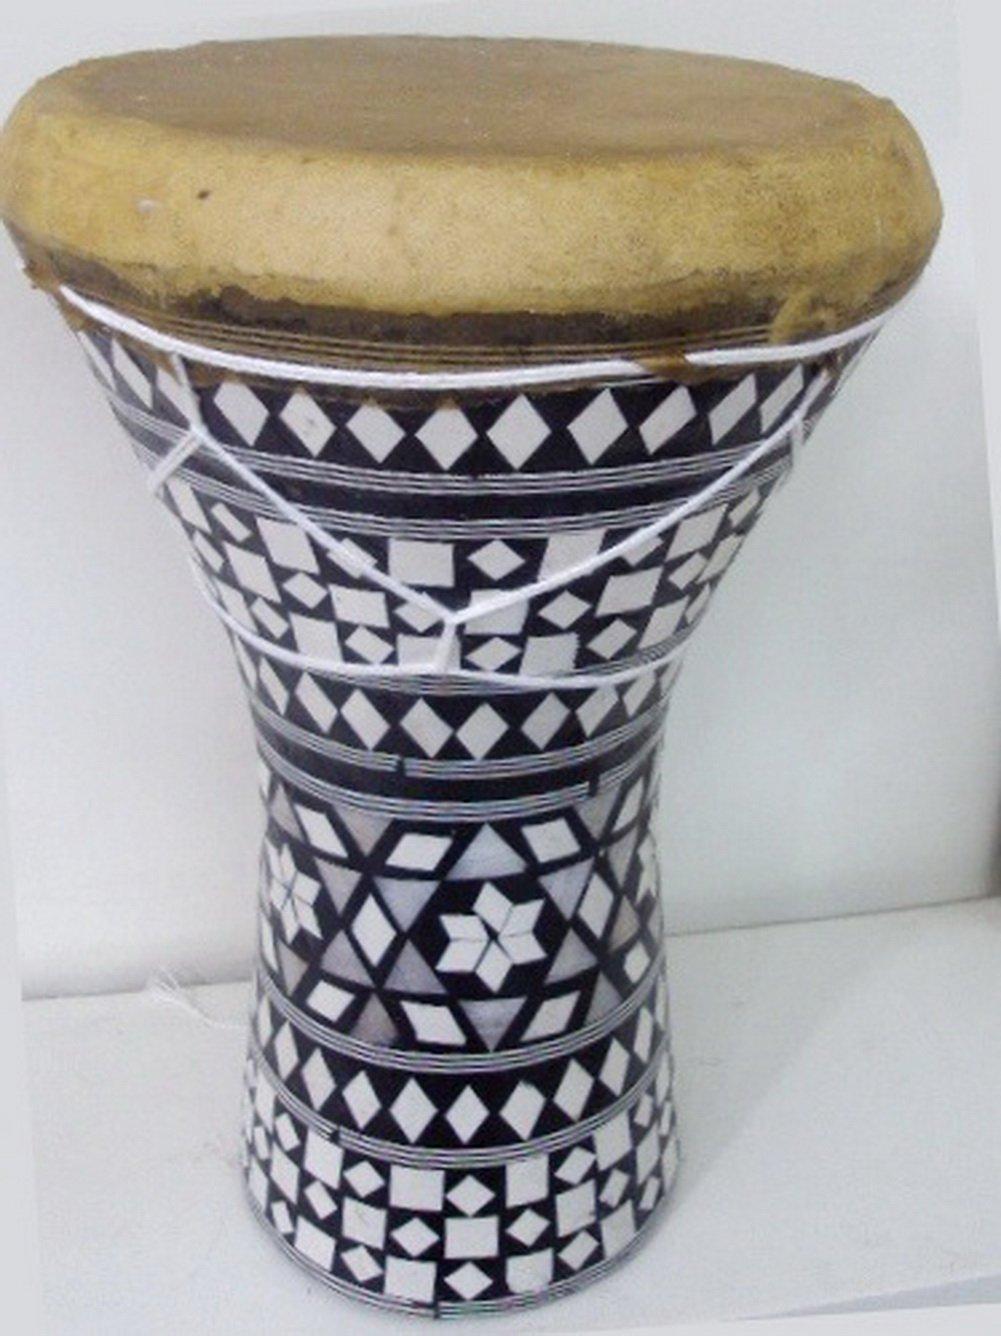 1PCS Large Egyptian Wooden Tabla Drum Doumbek Goat Skin Inlaid Handmade 11''